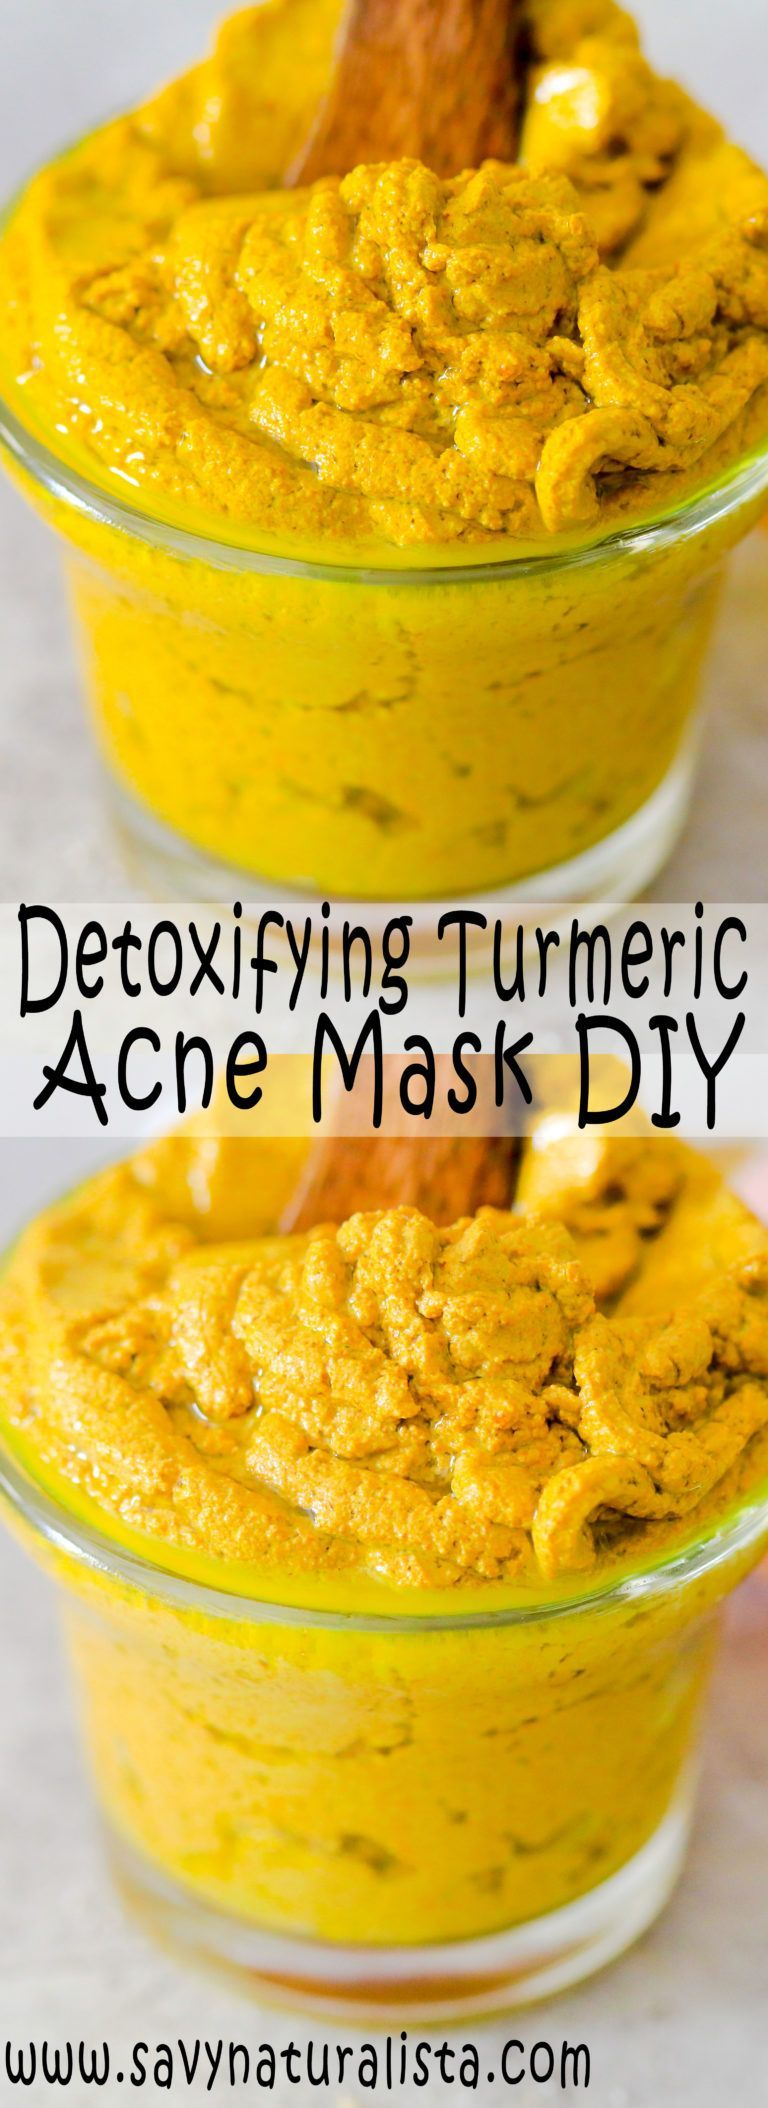 Detoxifying Turmeric Acne Face Mask Turmeric face mask